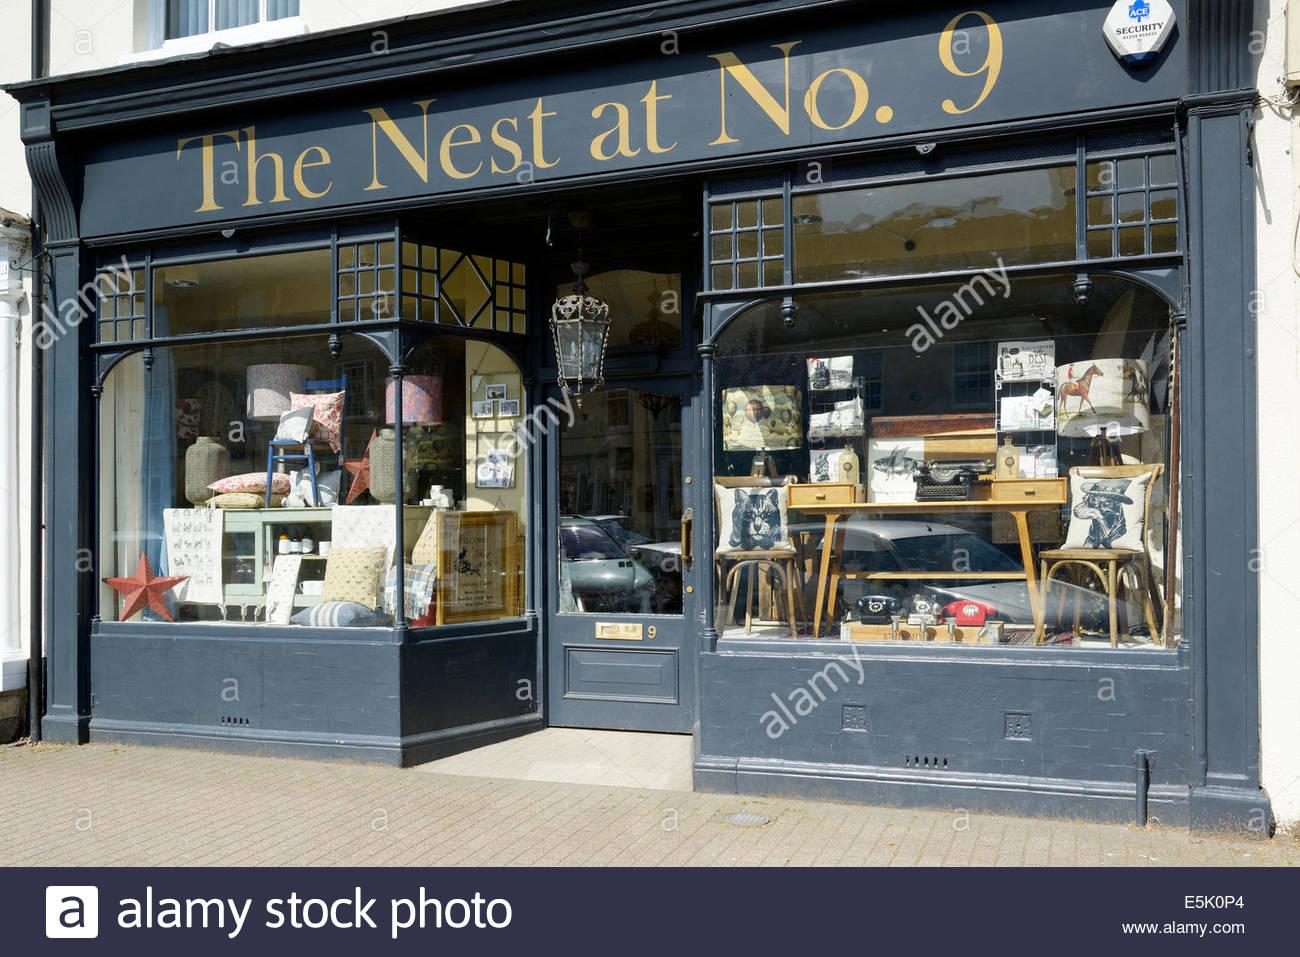 The Nest at No. 9, furniture shop, High Street, Olney, Buckinghamshire, England UK - Stock Image